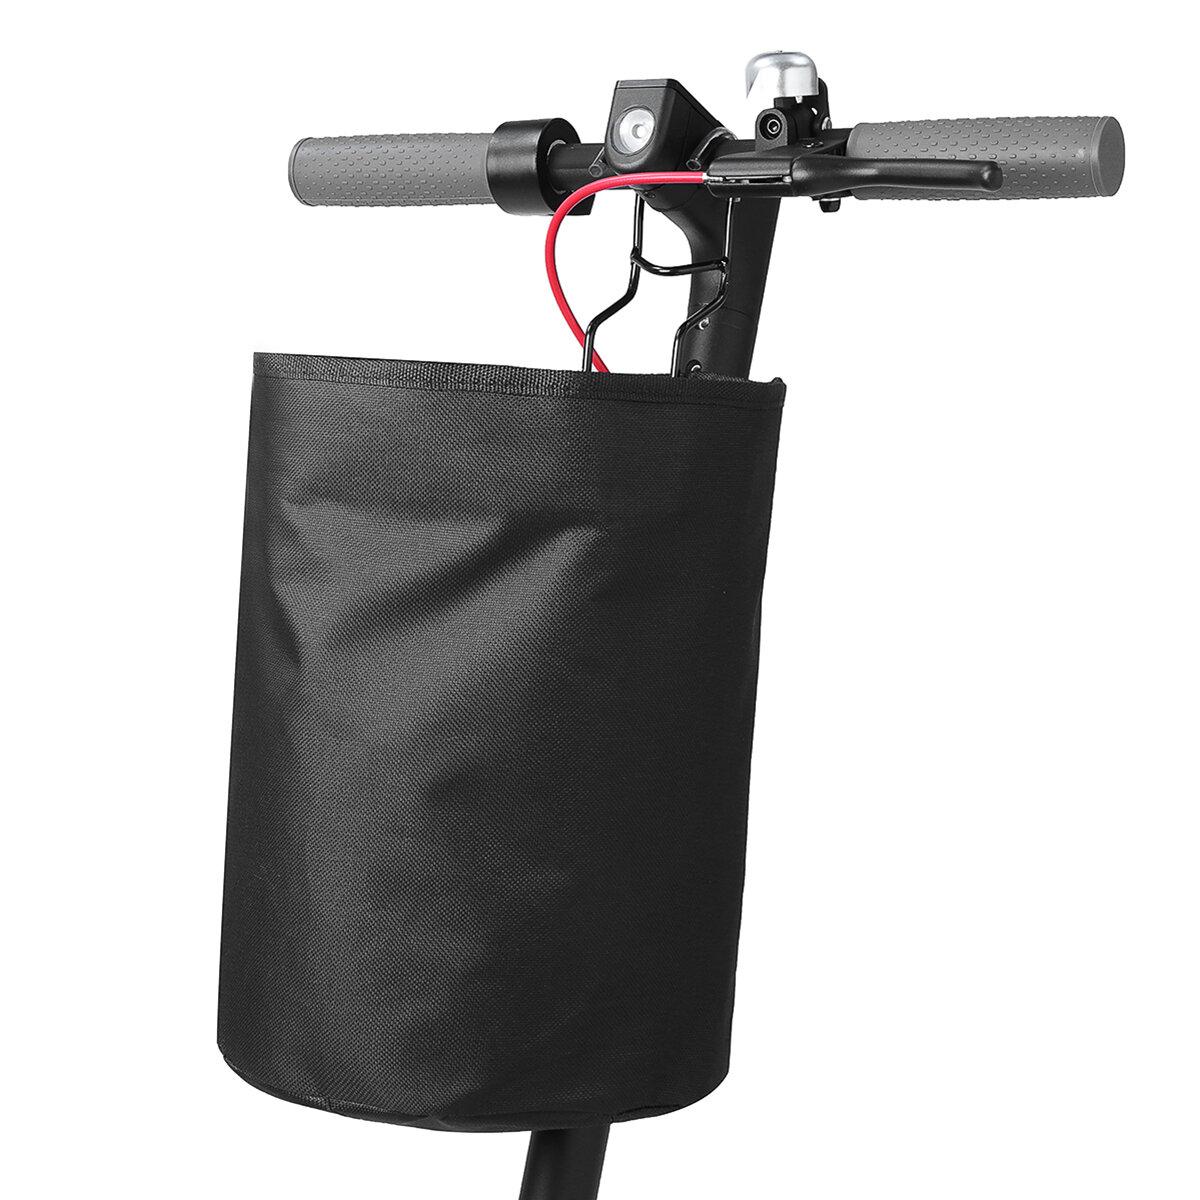 BIKIGHT Storage Basket For Xiaomi Mijia M365 Es1 Es2 Universal Electric Scooter